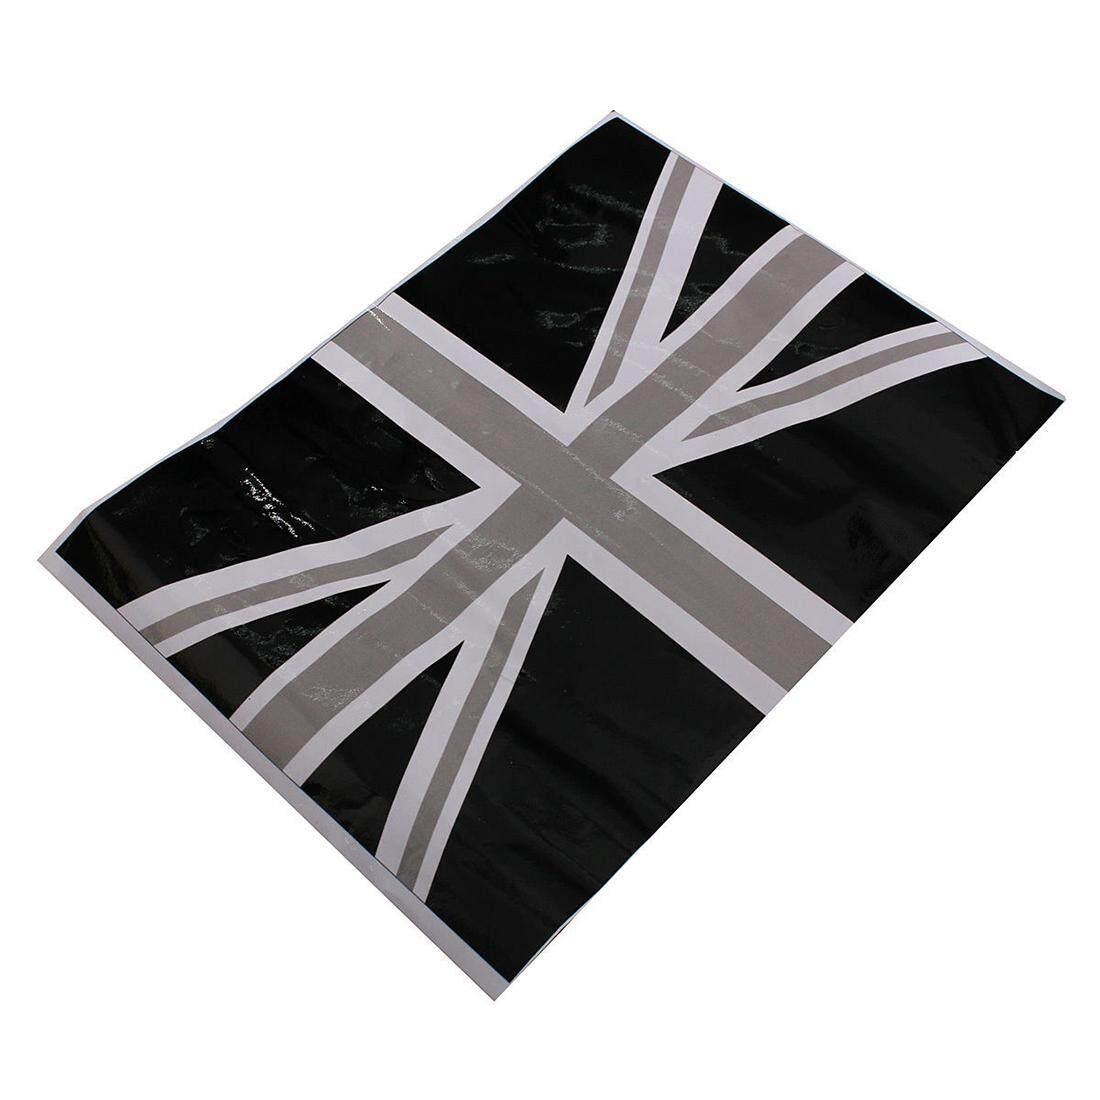 Fitur 2 X Rice Word Flag Side Mirrors Black Decals Vinyl Stickers Frame Photo Gantung Animals Lucu 3 Inch For Bmw Mini Cooper